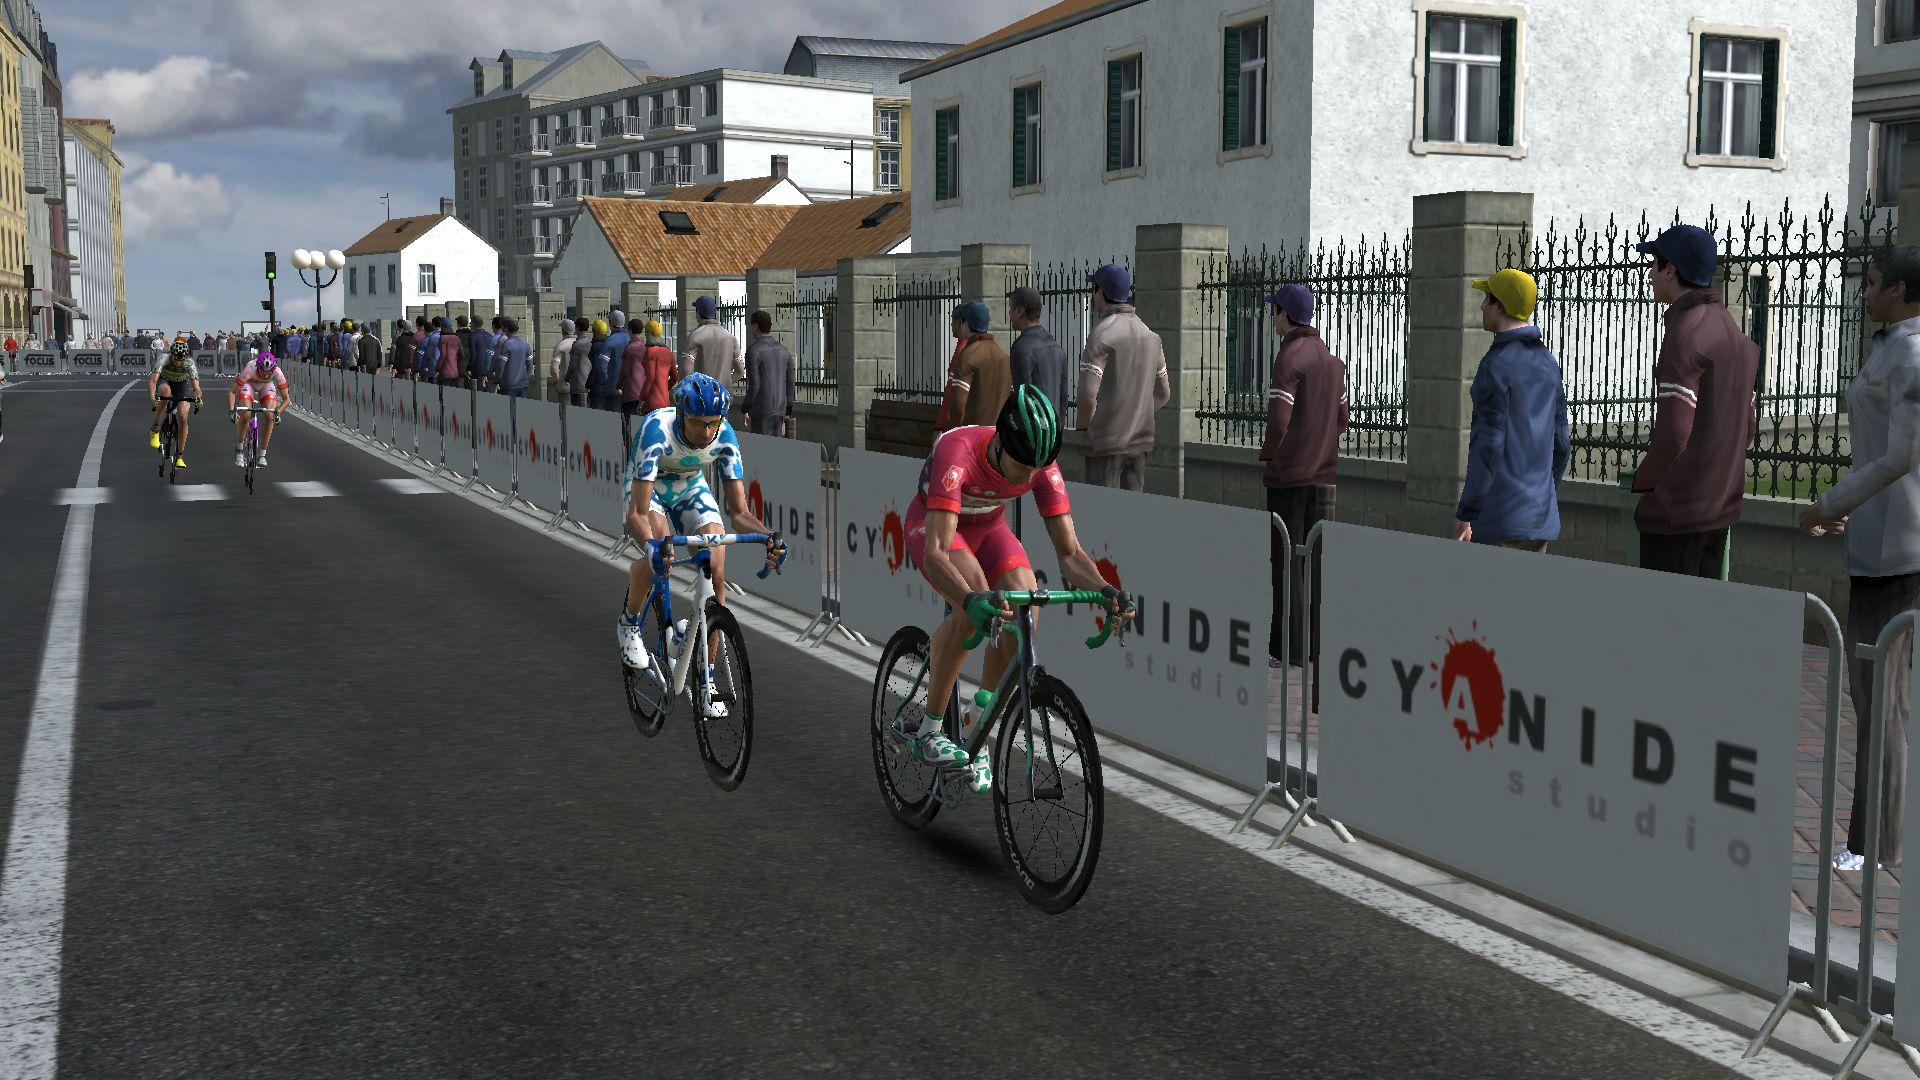 pcmdaily.com/images/mg/2019/Races/GTM/Giro/mg19_giro_18_PCM0245.jpg